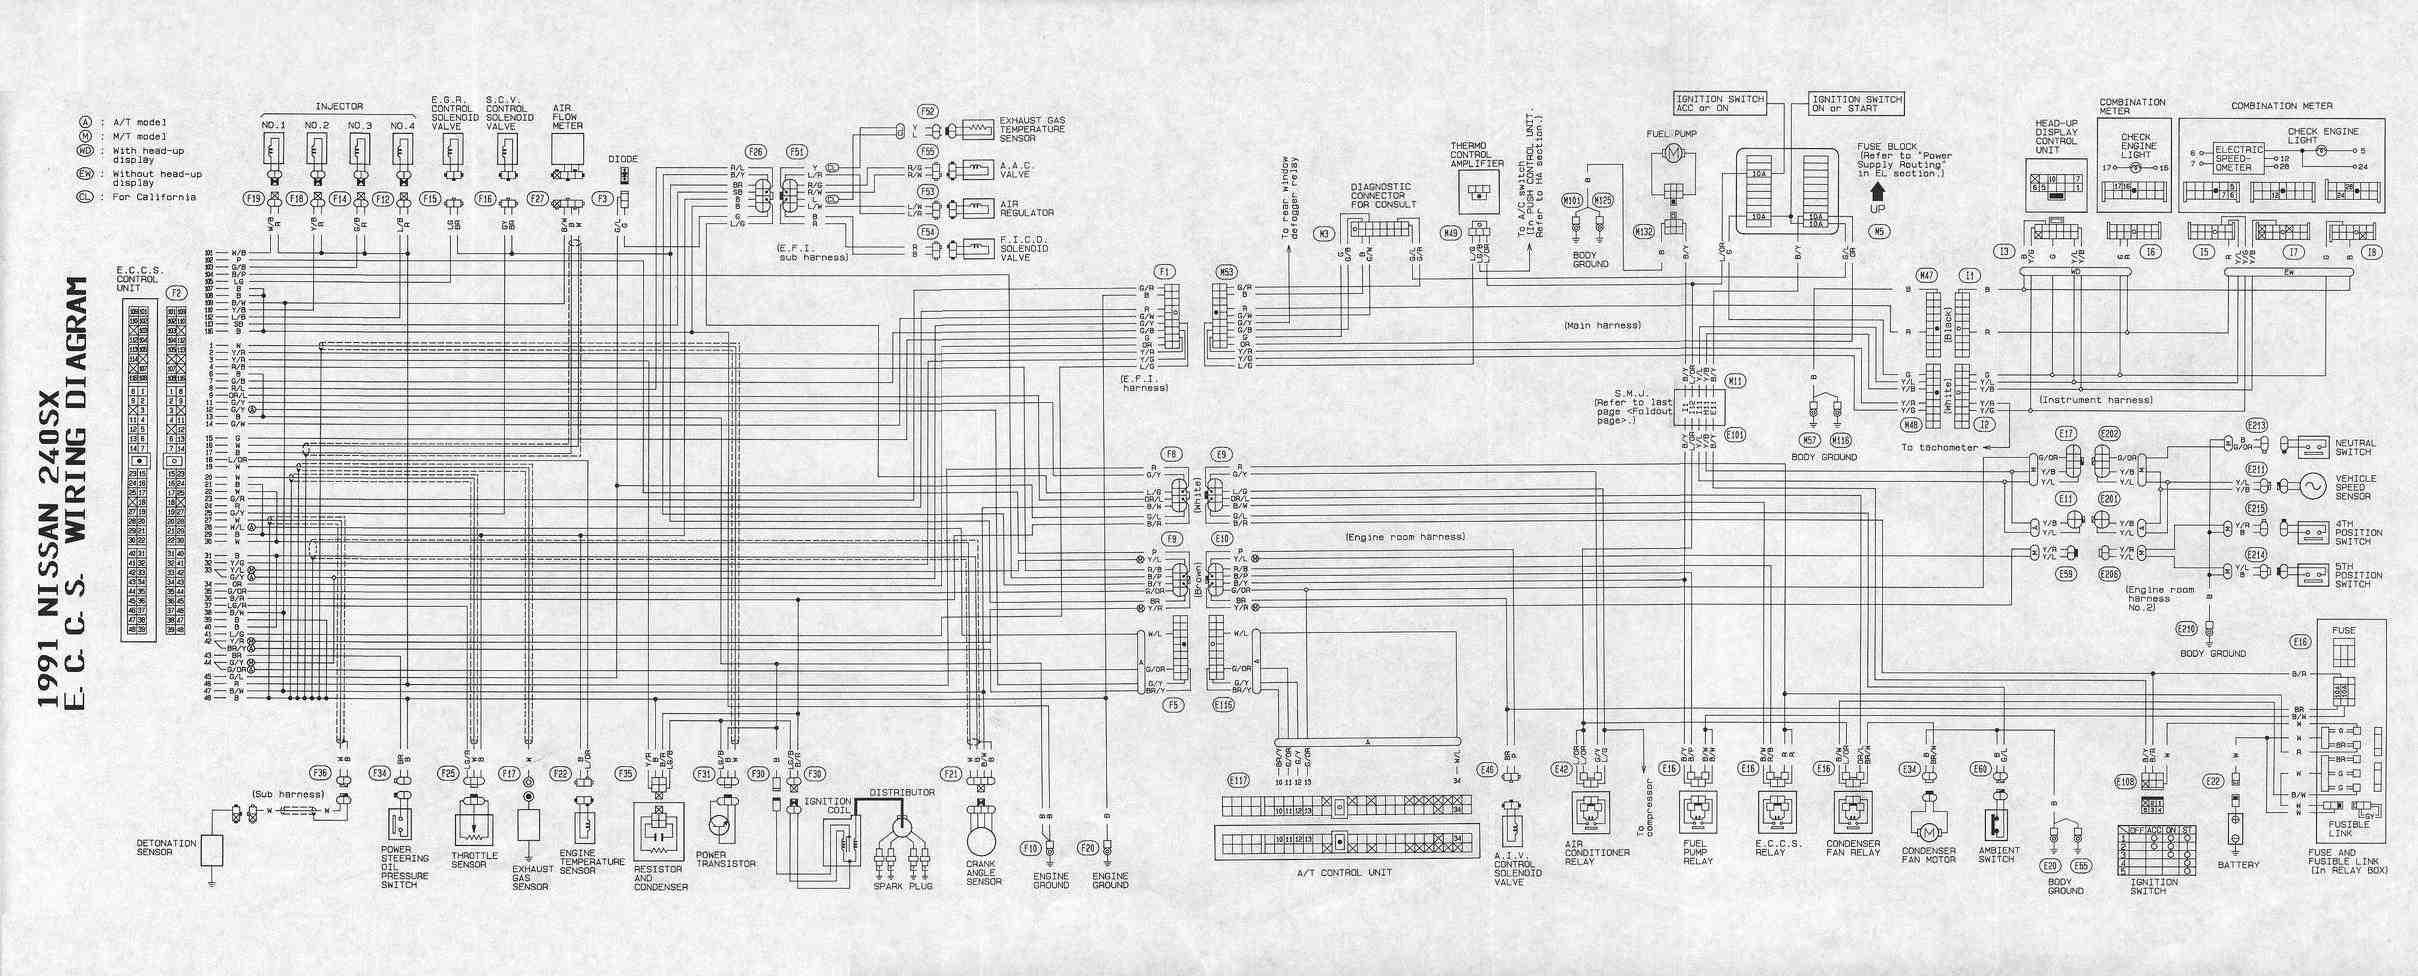 1990 nissan 300zx ignition wiring diagram somurich com 300zx ignition coil wiring diagram 1990 nissan 300zx [ 2418 x 976 Pixel ]